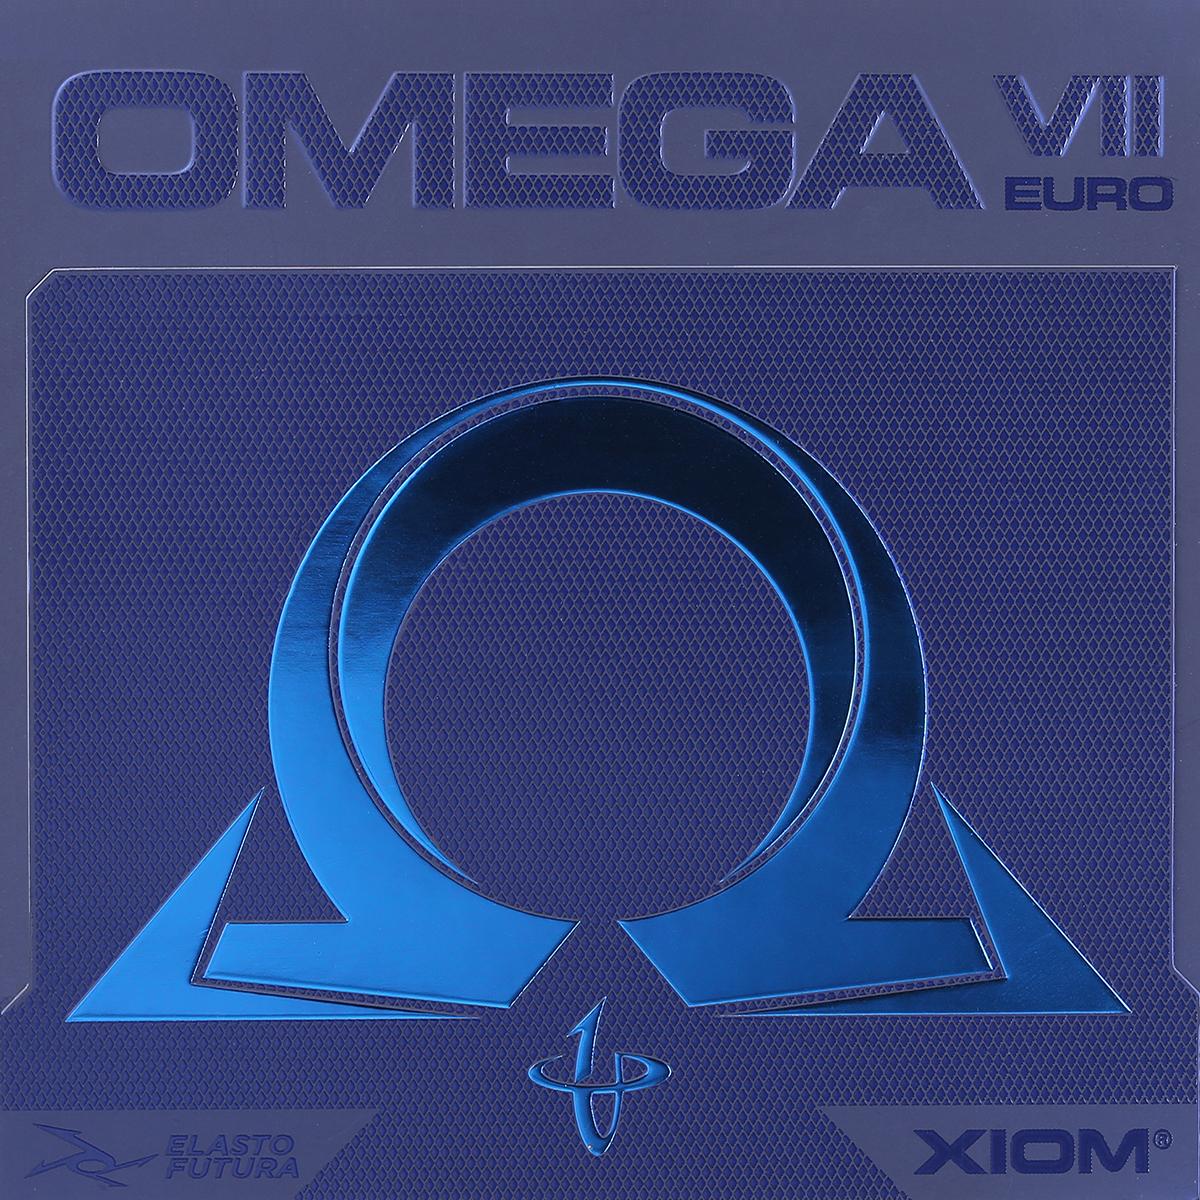 Xiom Omega VII Euro Table Tennis Rubber